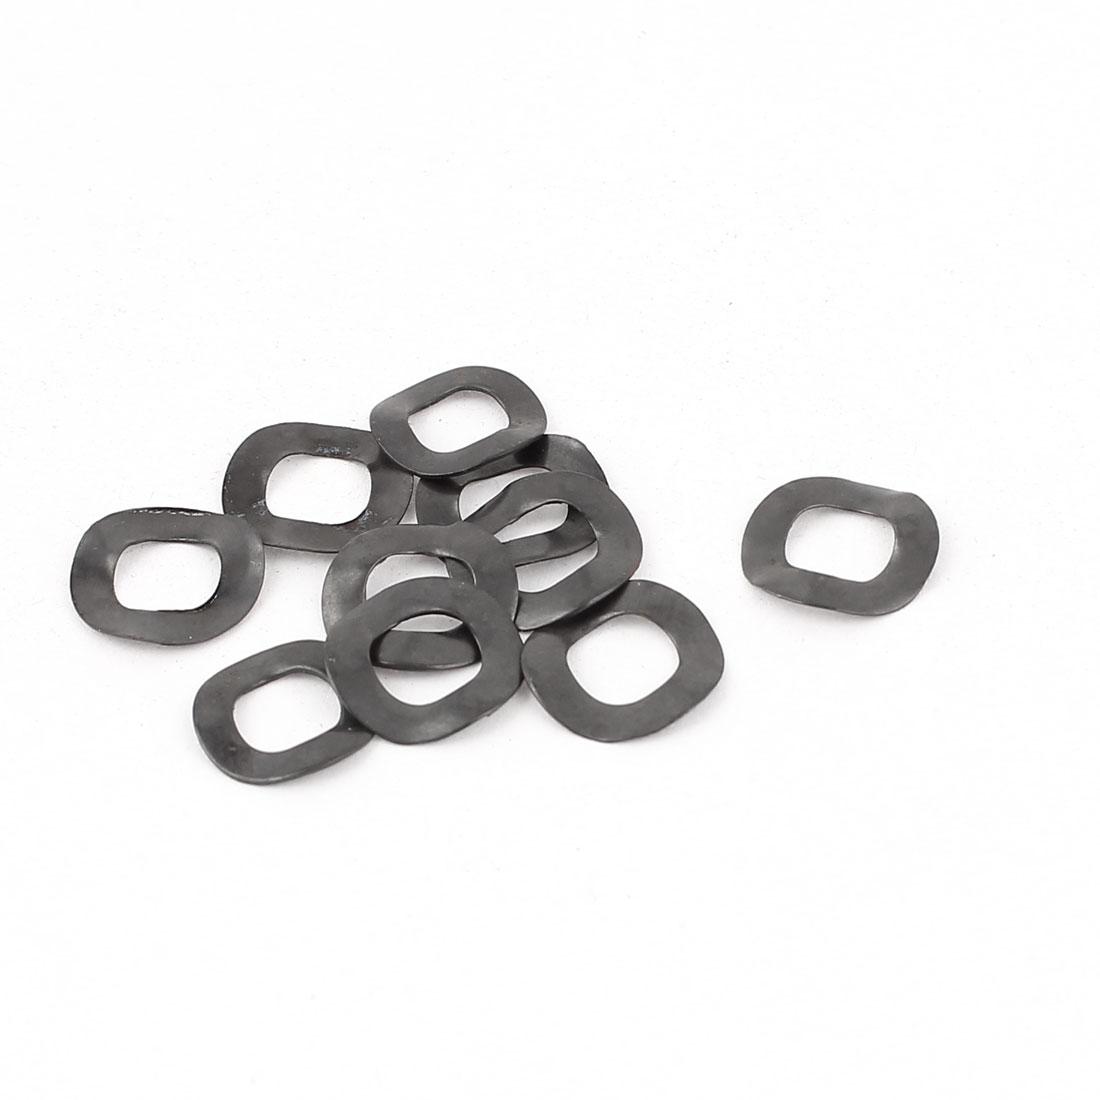 10 Pcs Black Metal Wave Crinkle Spring Washer 6mm x 11mm x 0.3mm